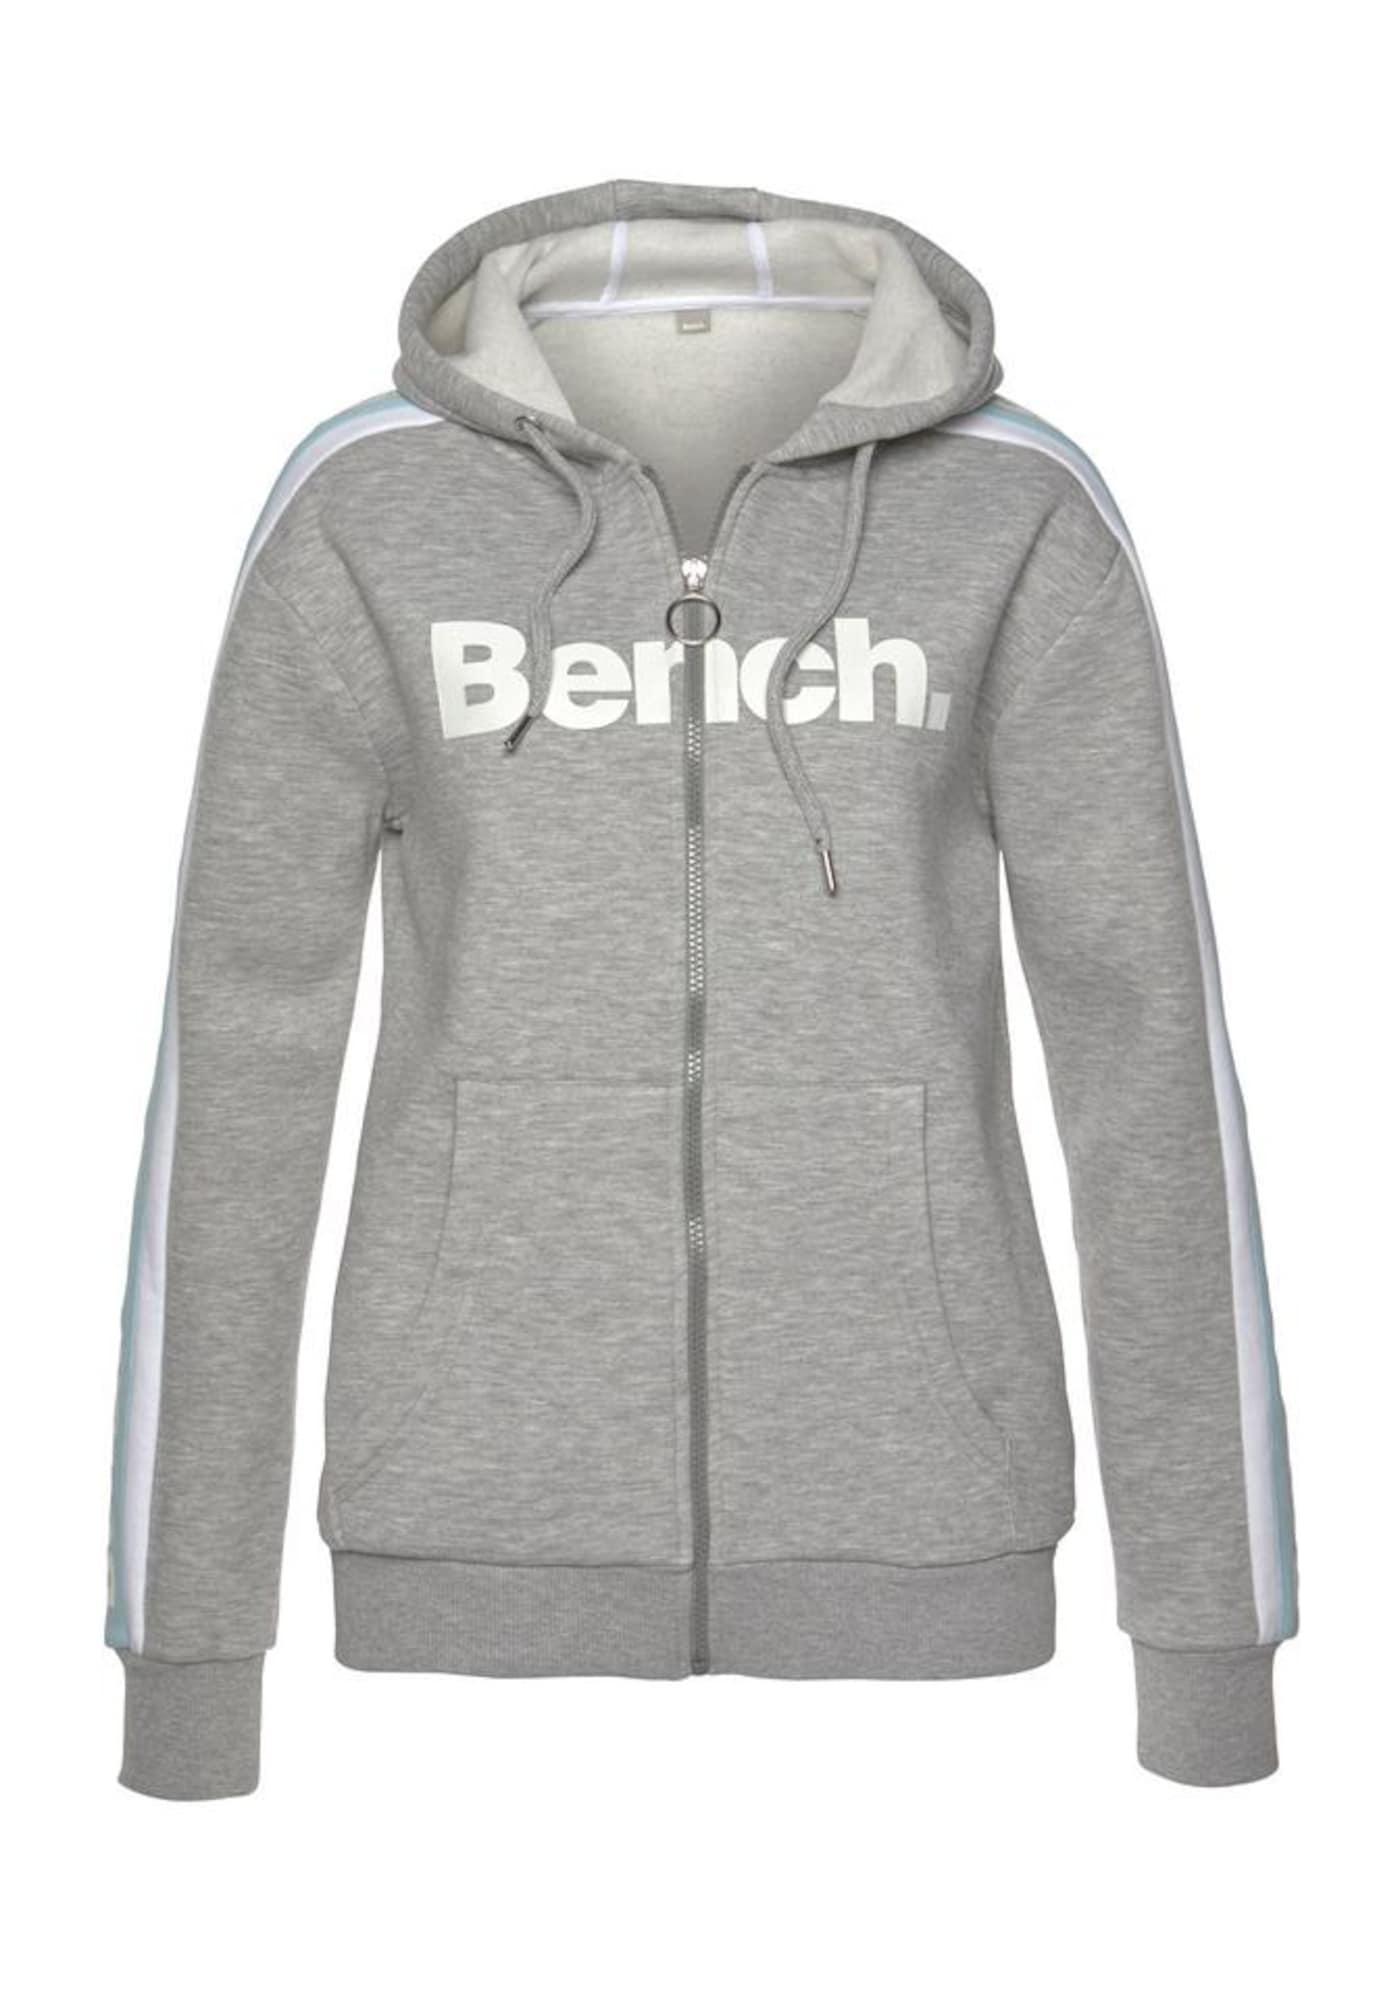 Sweatjacke   Bekleidung > Sweatshirts & -jacken > Sweatjacken   Bench